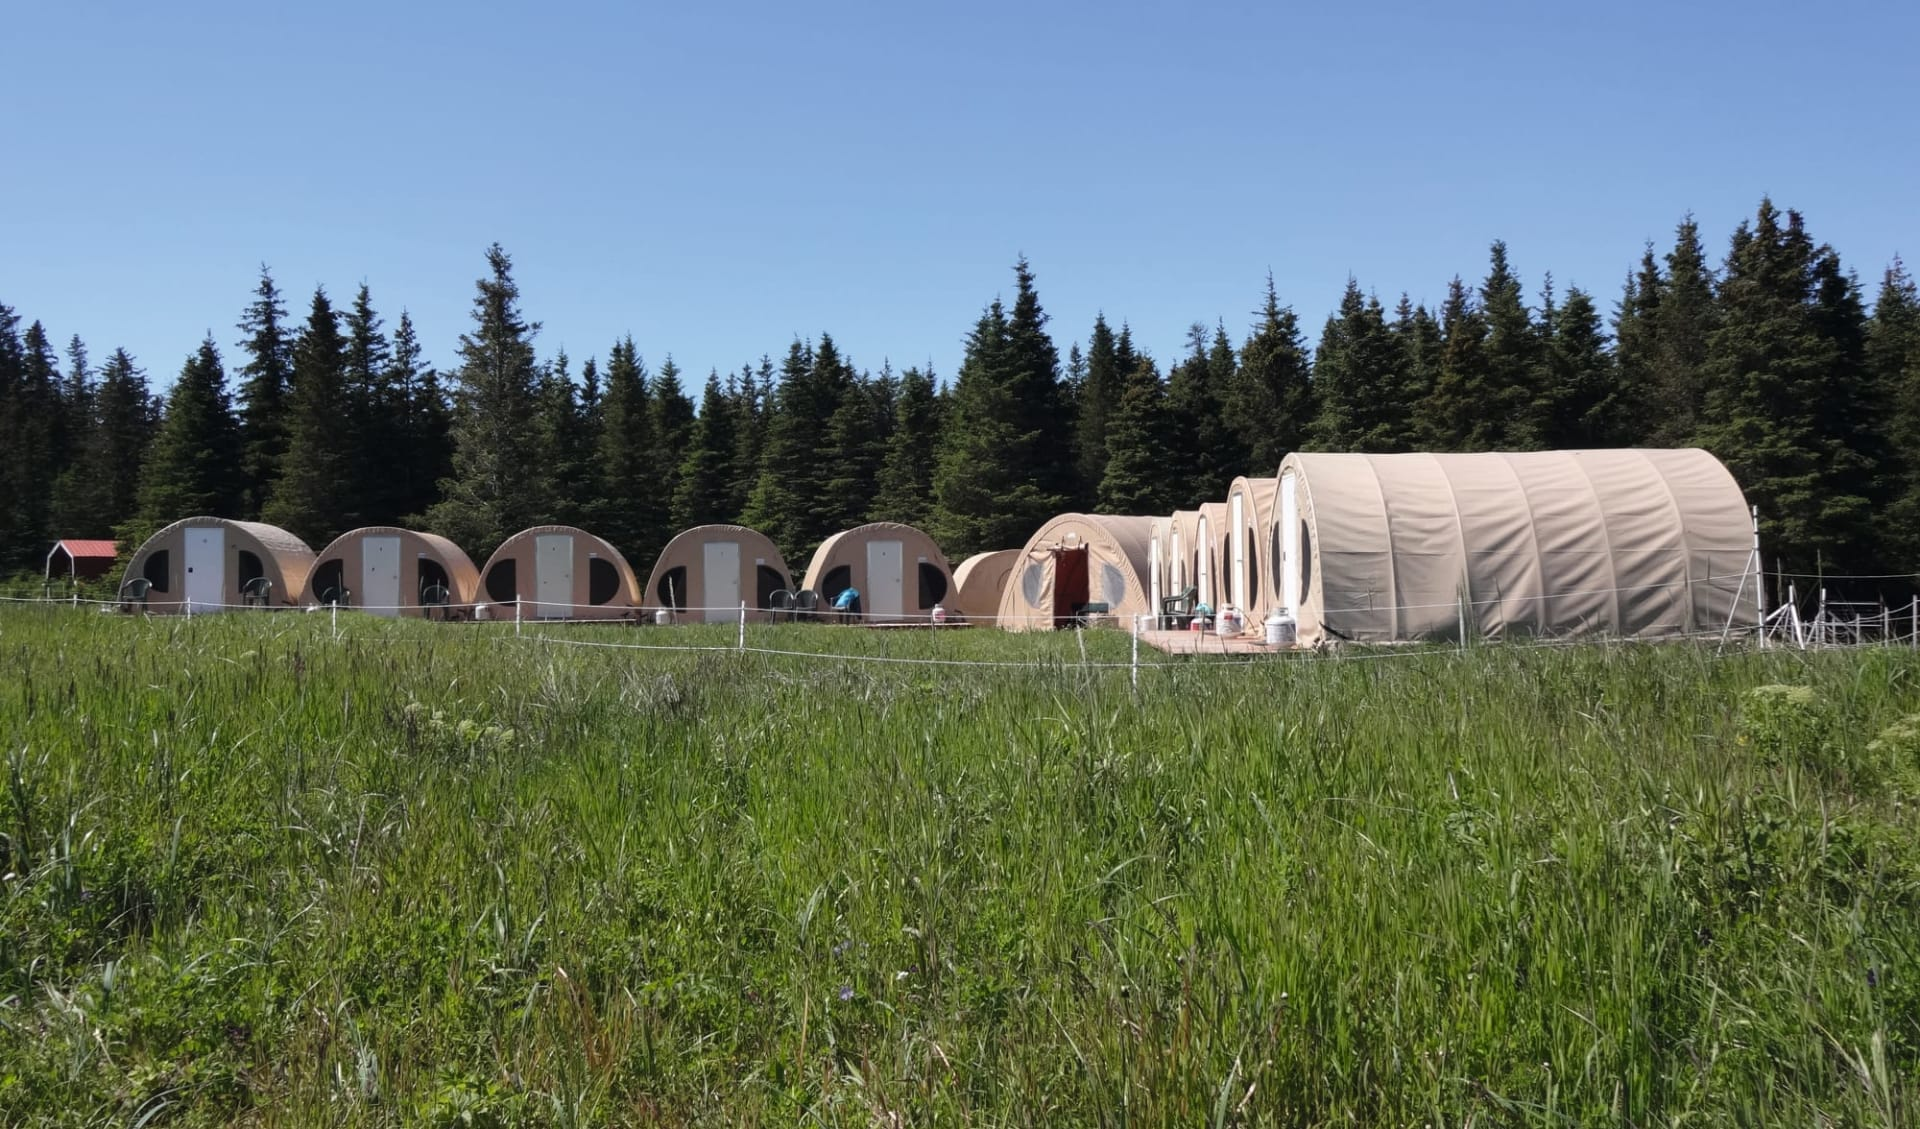 Bärenbeobachtung Great Alaska Bear Camp ab Anchorage: exterior_Great Alaska Bear Camp